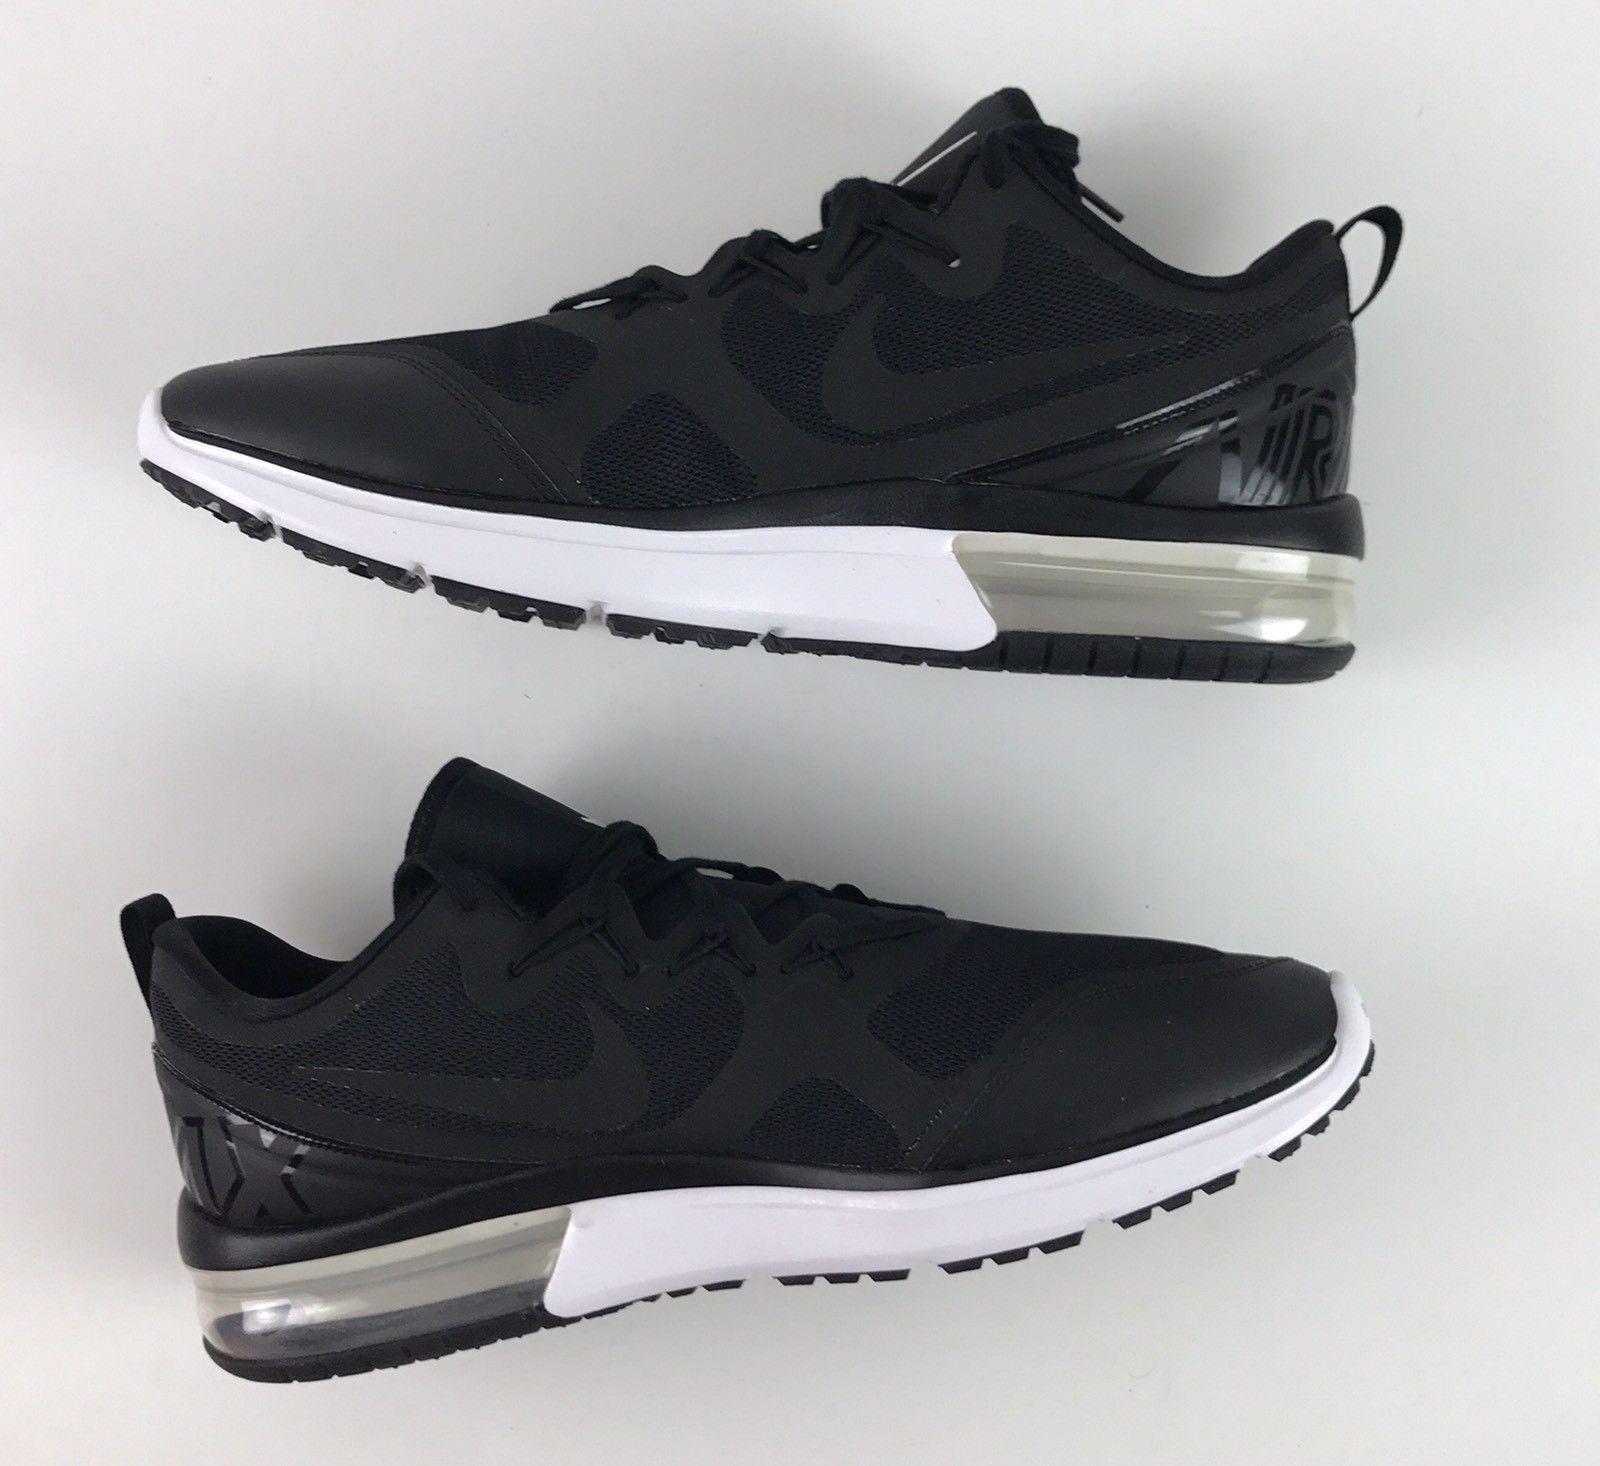 49cbec312fb1 Nike Air Max Fury AA5739-001 Black White Men s Running Shoes NEW! SZ ...